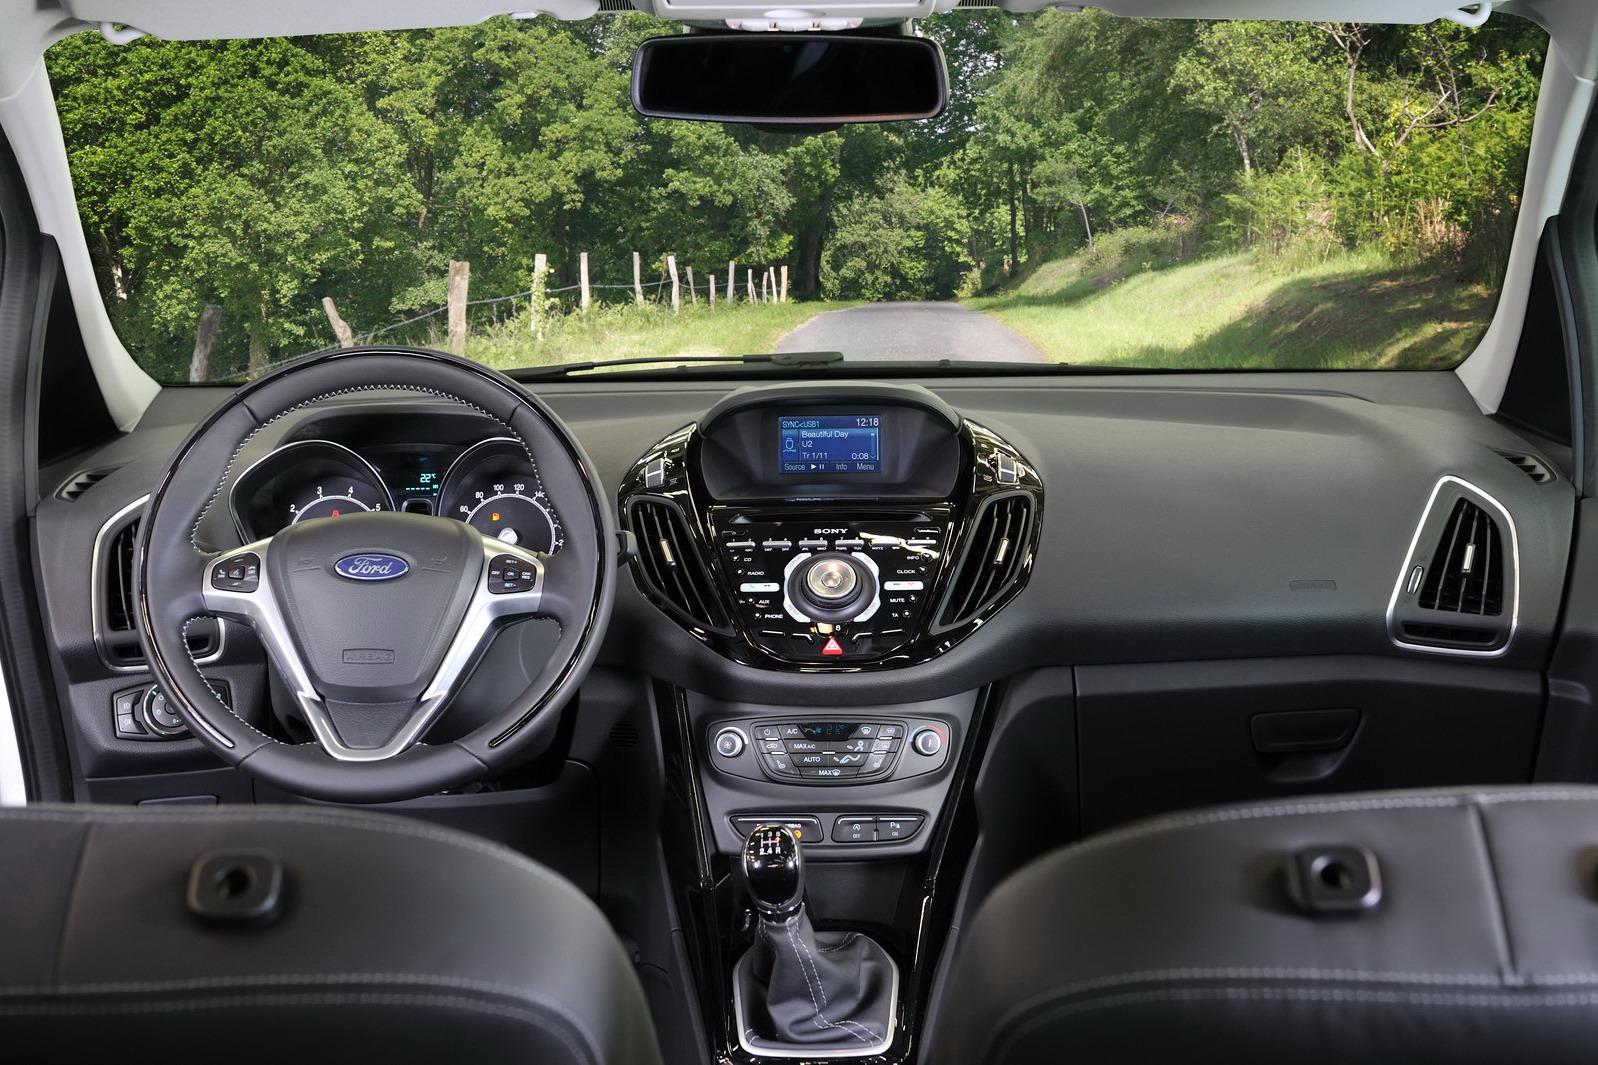 Ford B Max Specs Amp Photos 2012 2013 2014 2015 2016